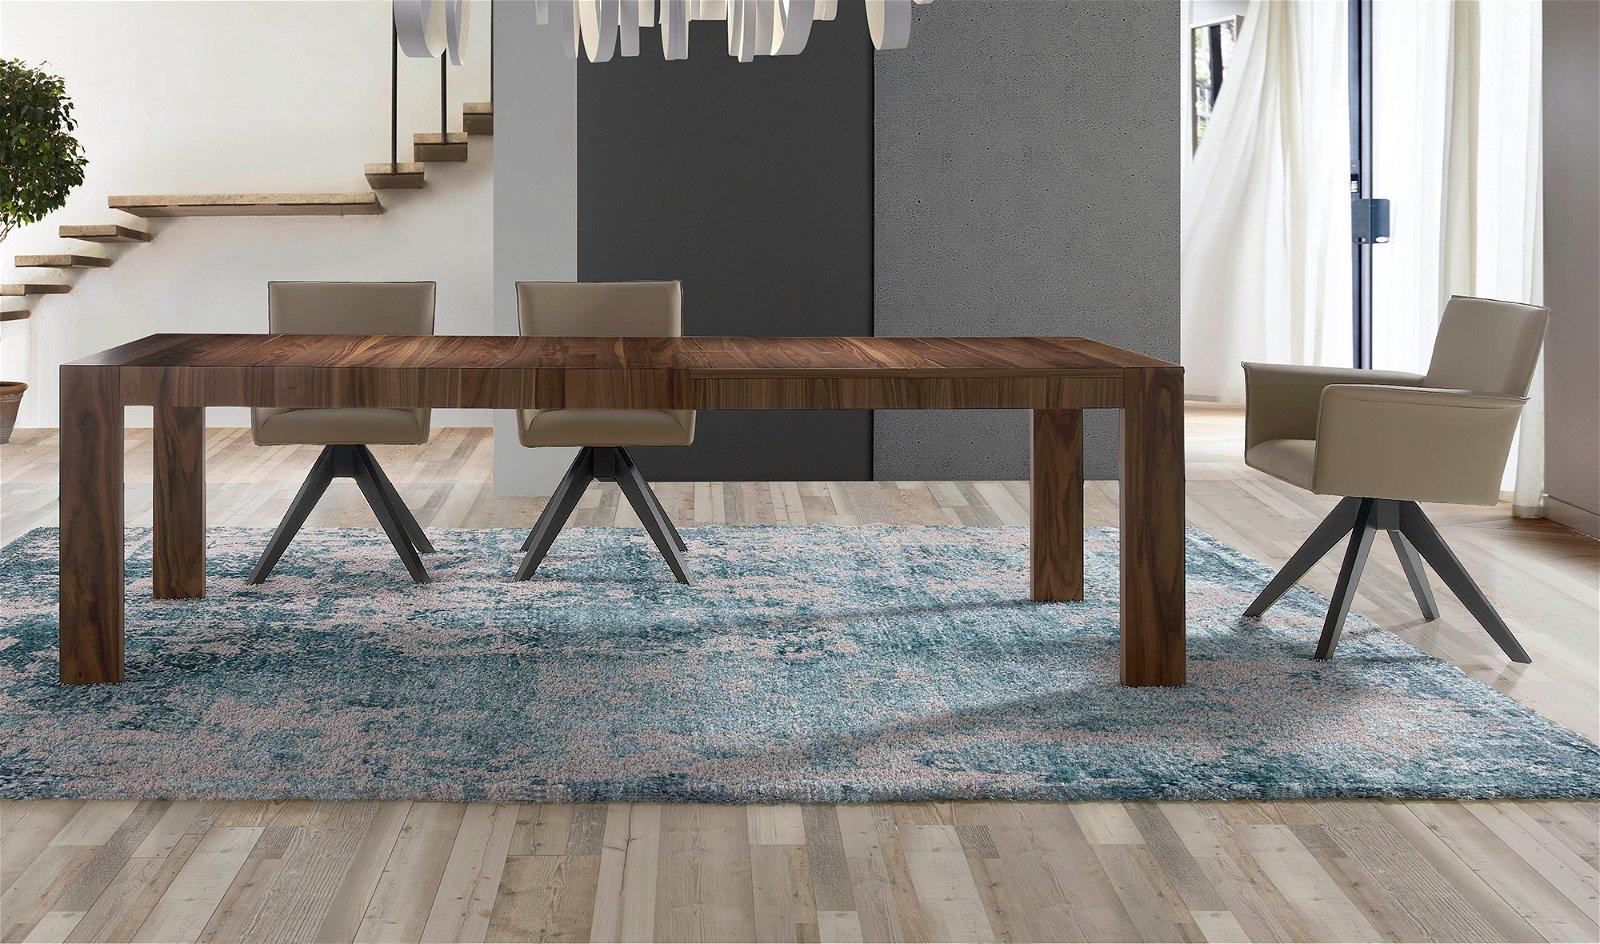 Sillón moderno tapizado y madera Bionaz